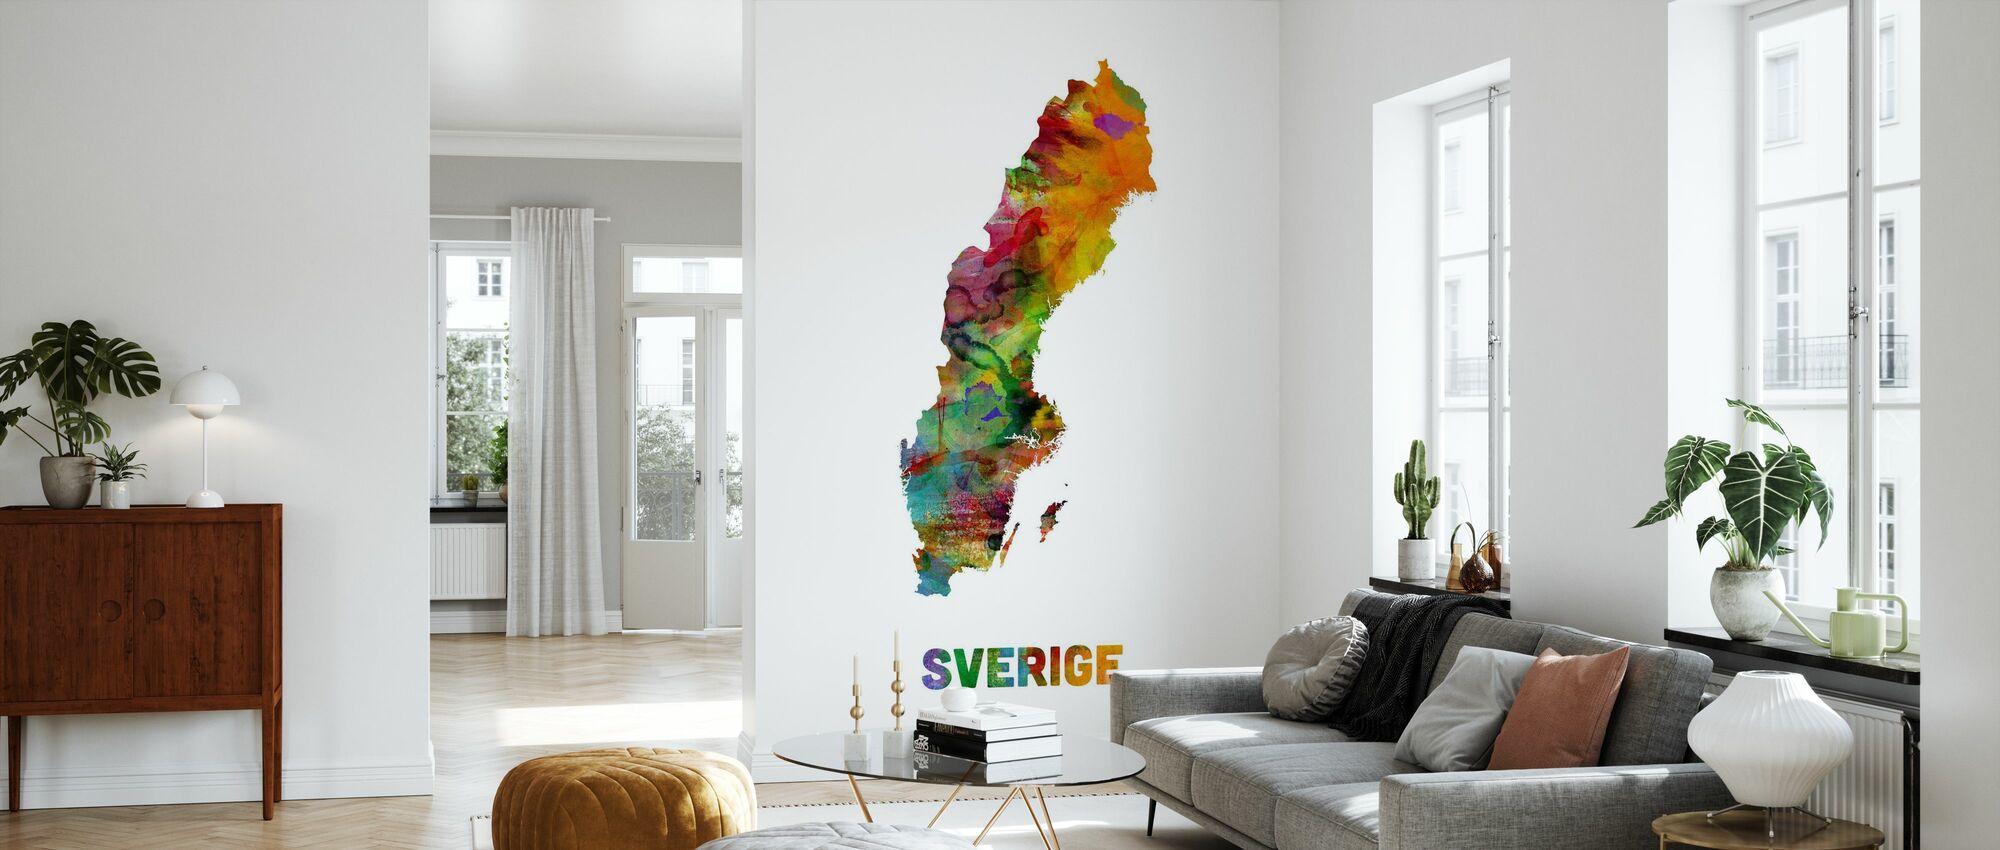 Suecia Mapa de acuarela - Papel pintado - Salón